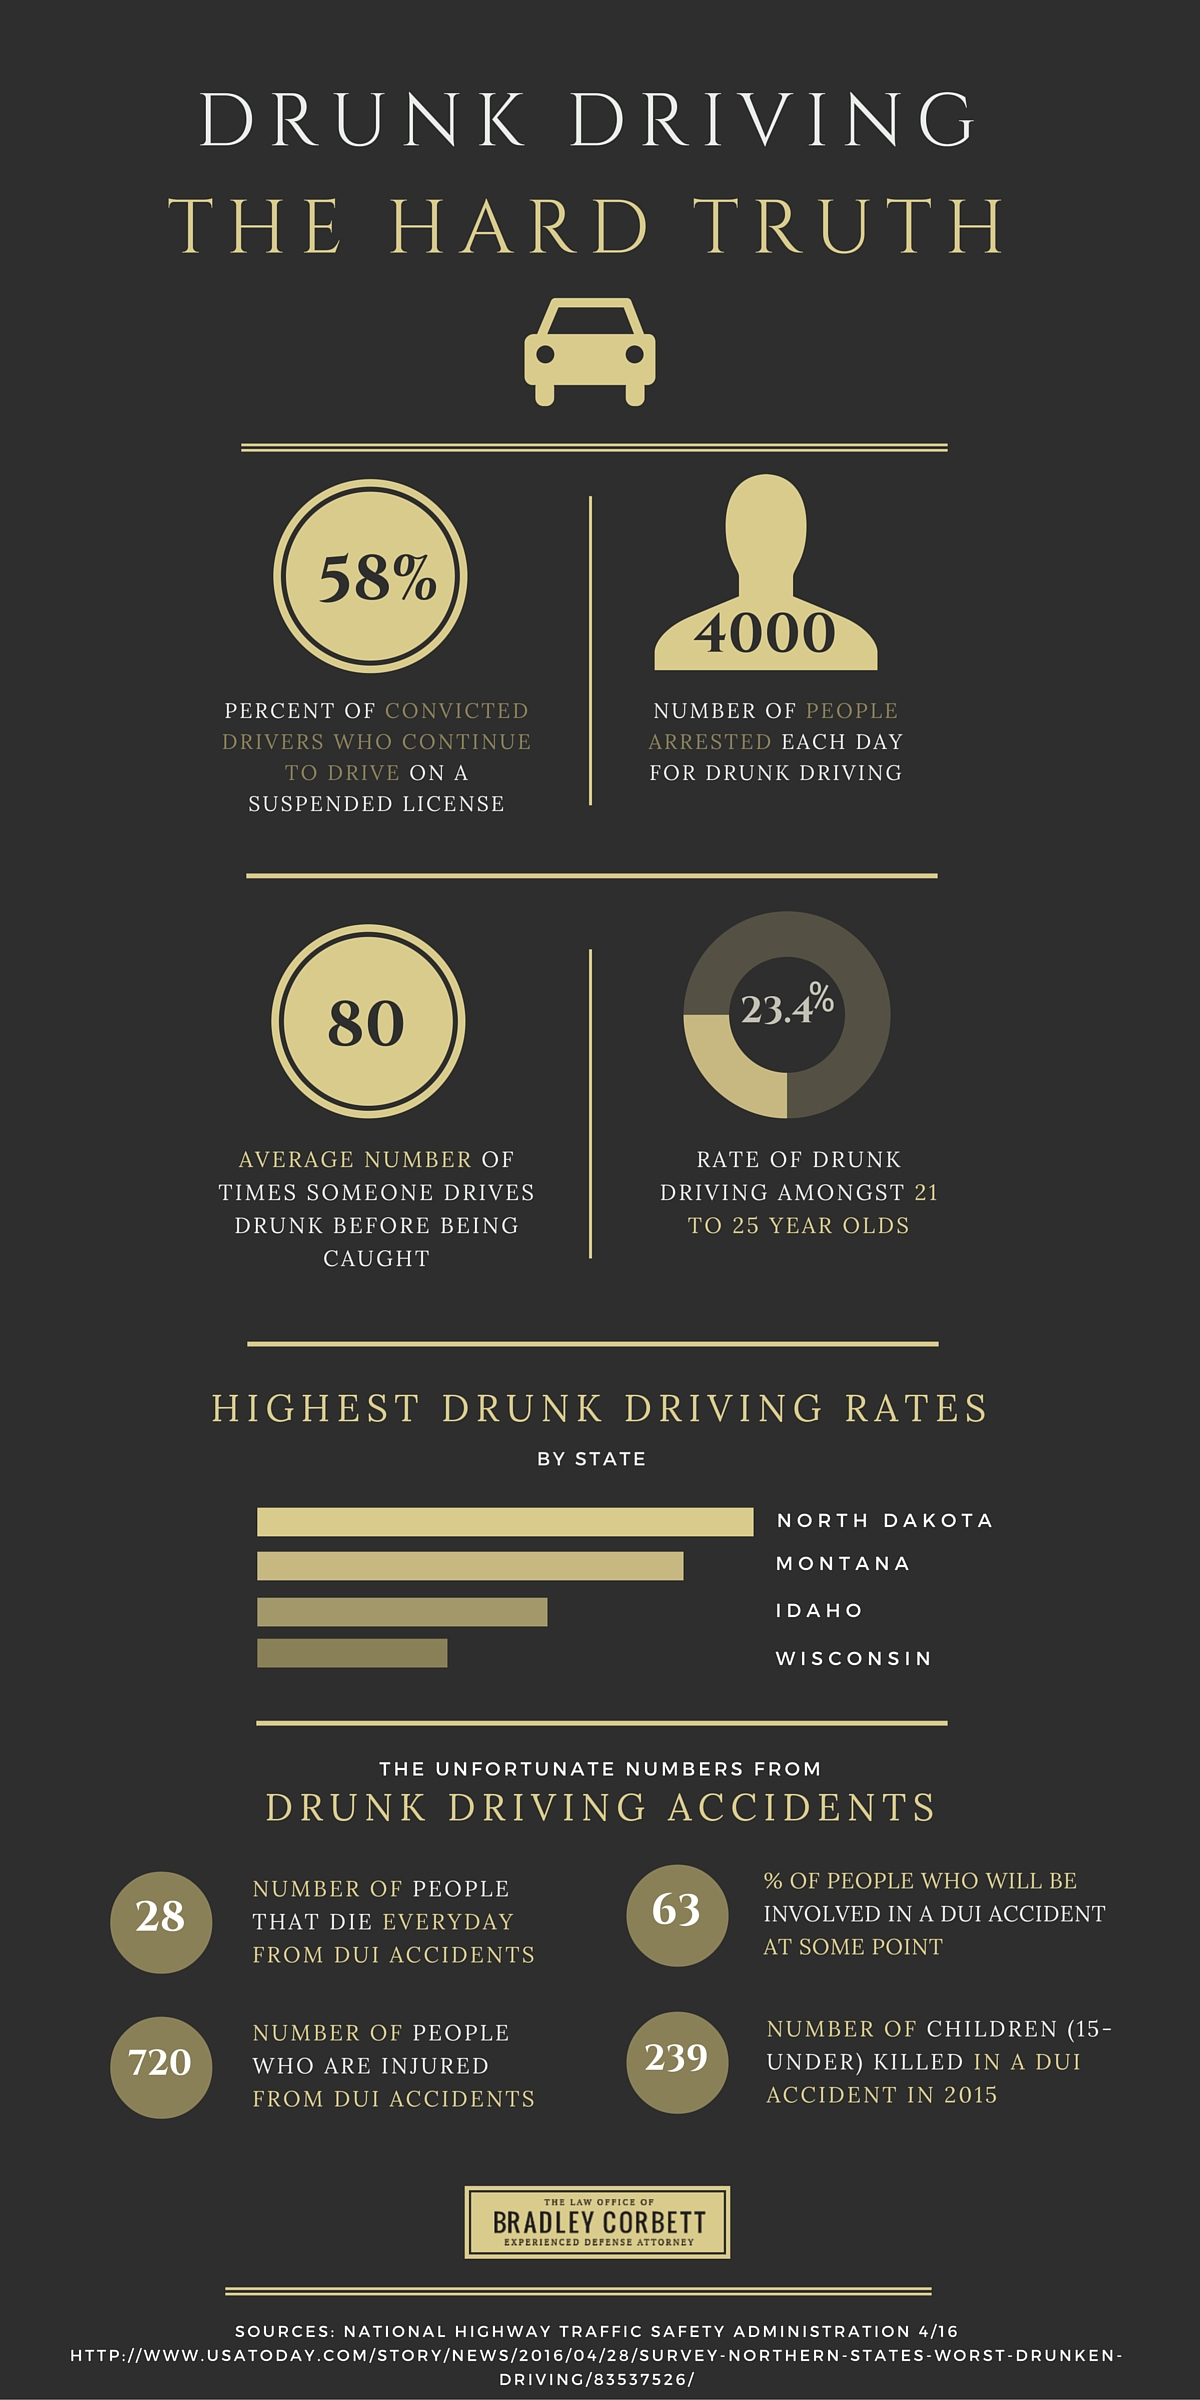 Drunk Driving Facts Infographic Bradley Corbett Law